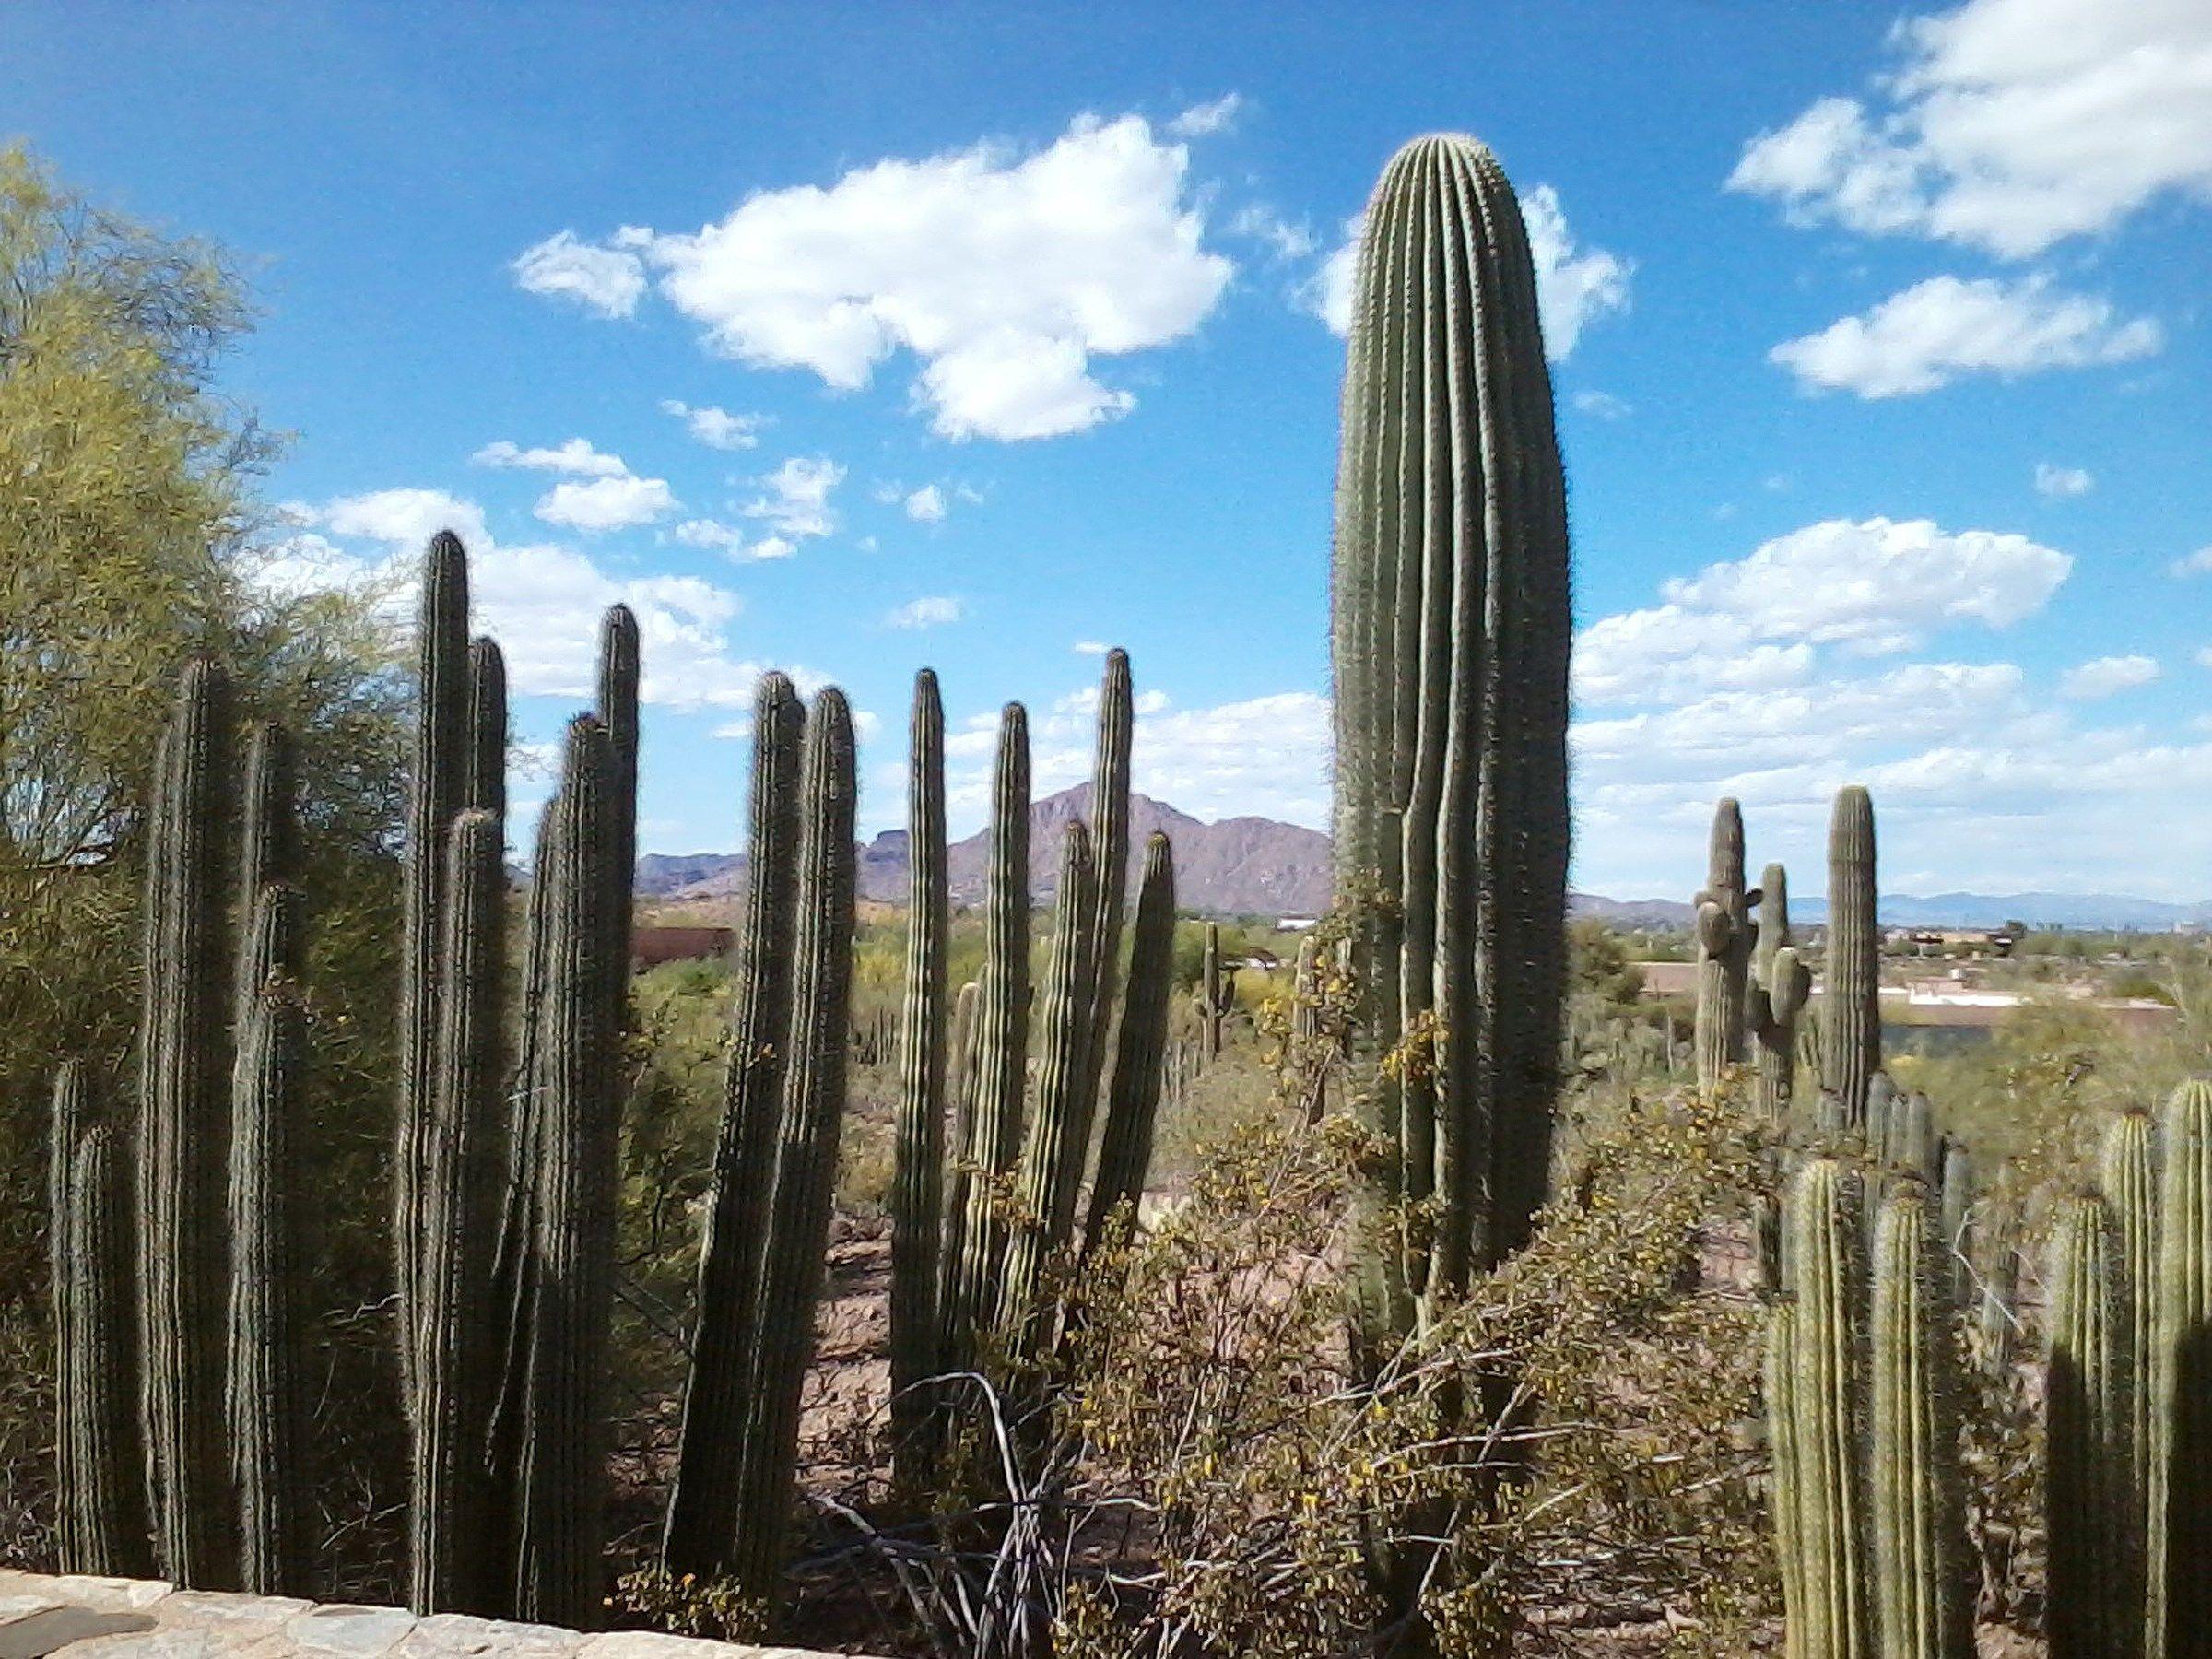 arizona desert wallpaper free hd widescreen (Nita Waite 2400 x 1800)